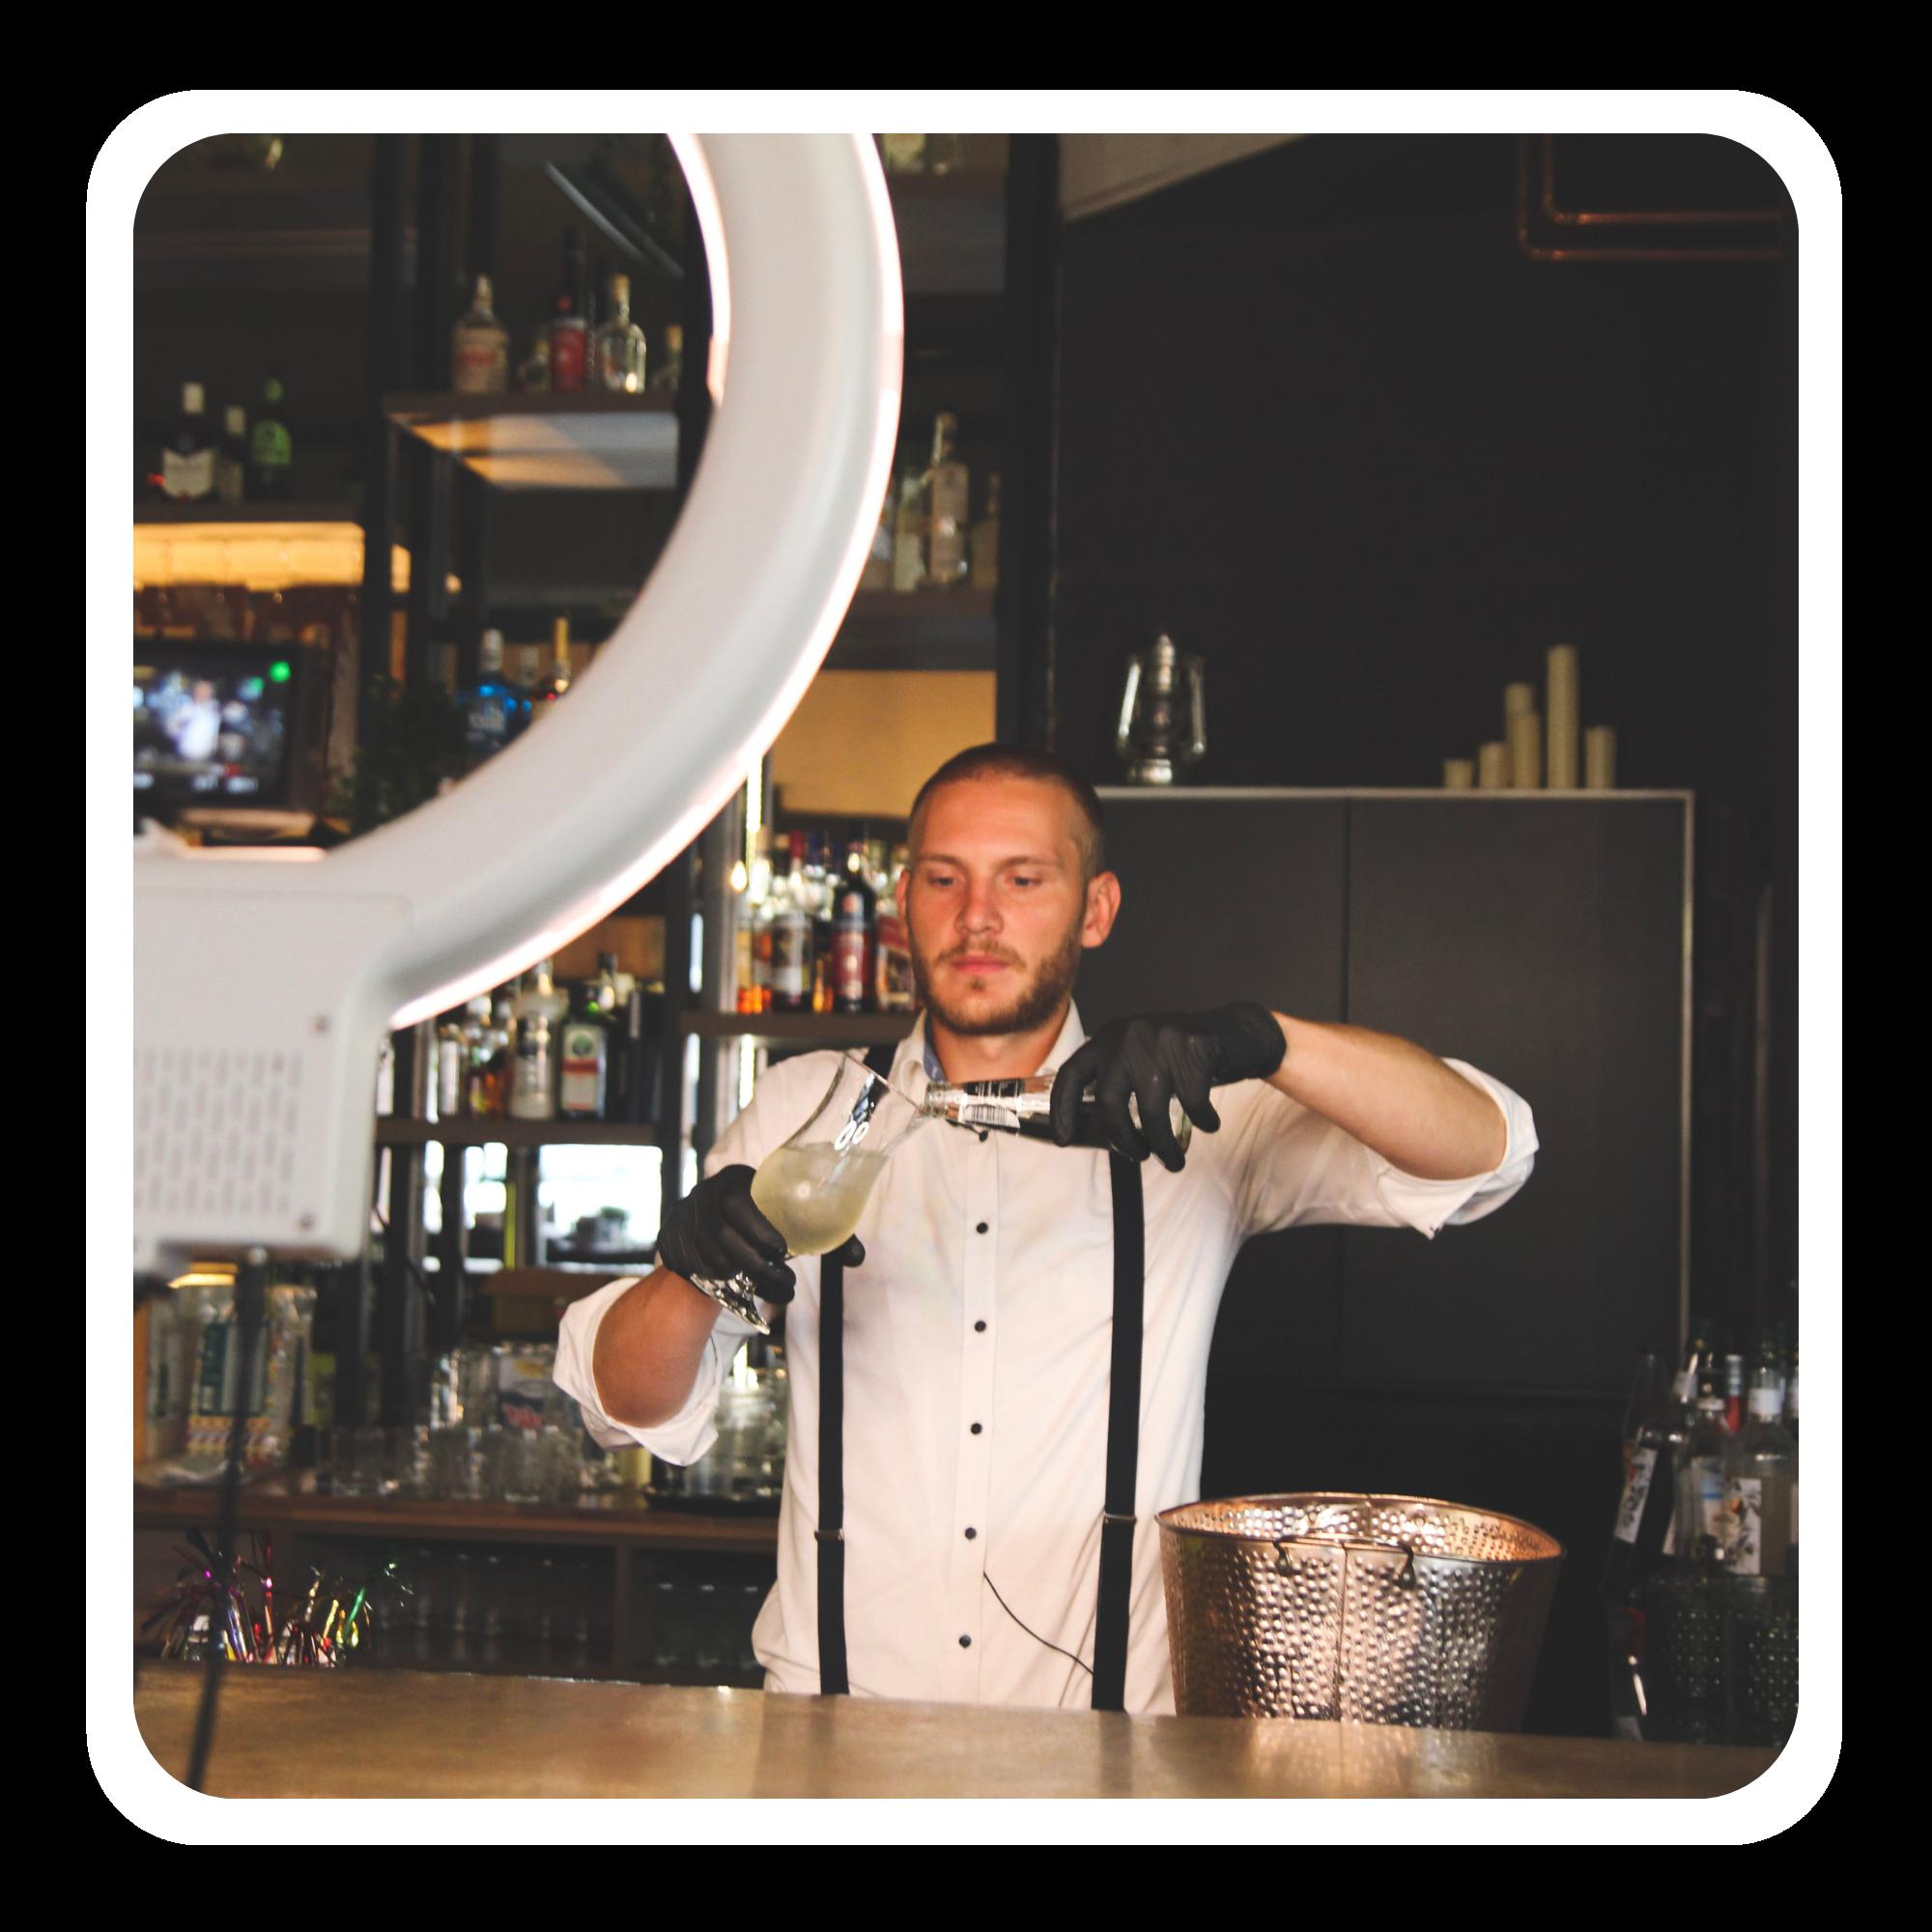 Firmenevents - Online Cocktail Tasting